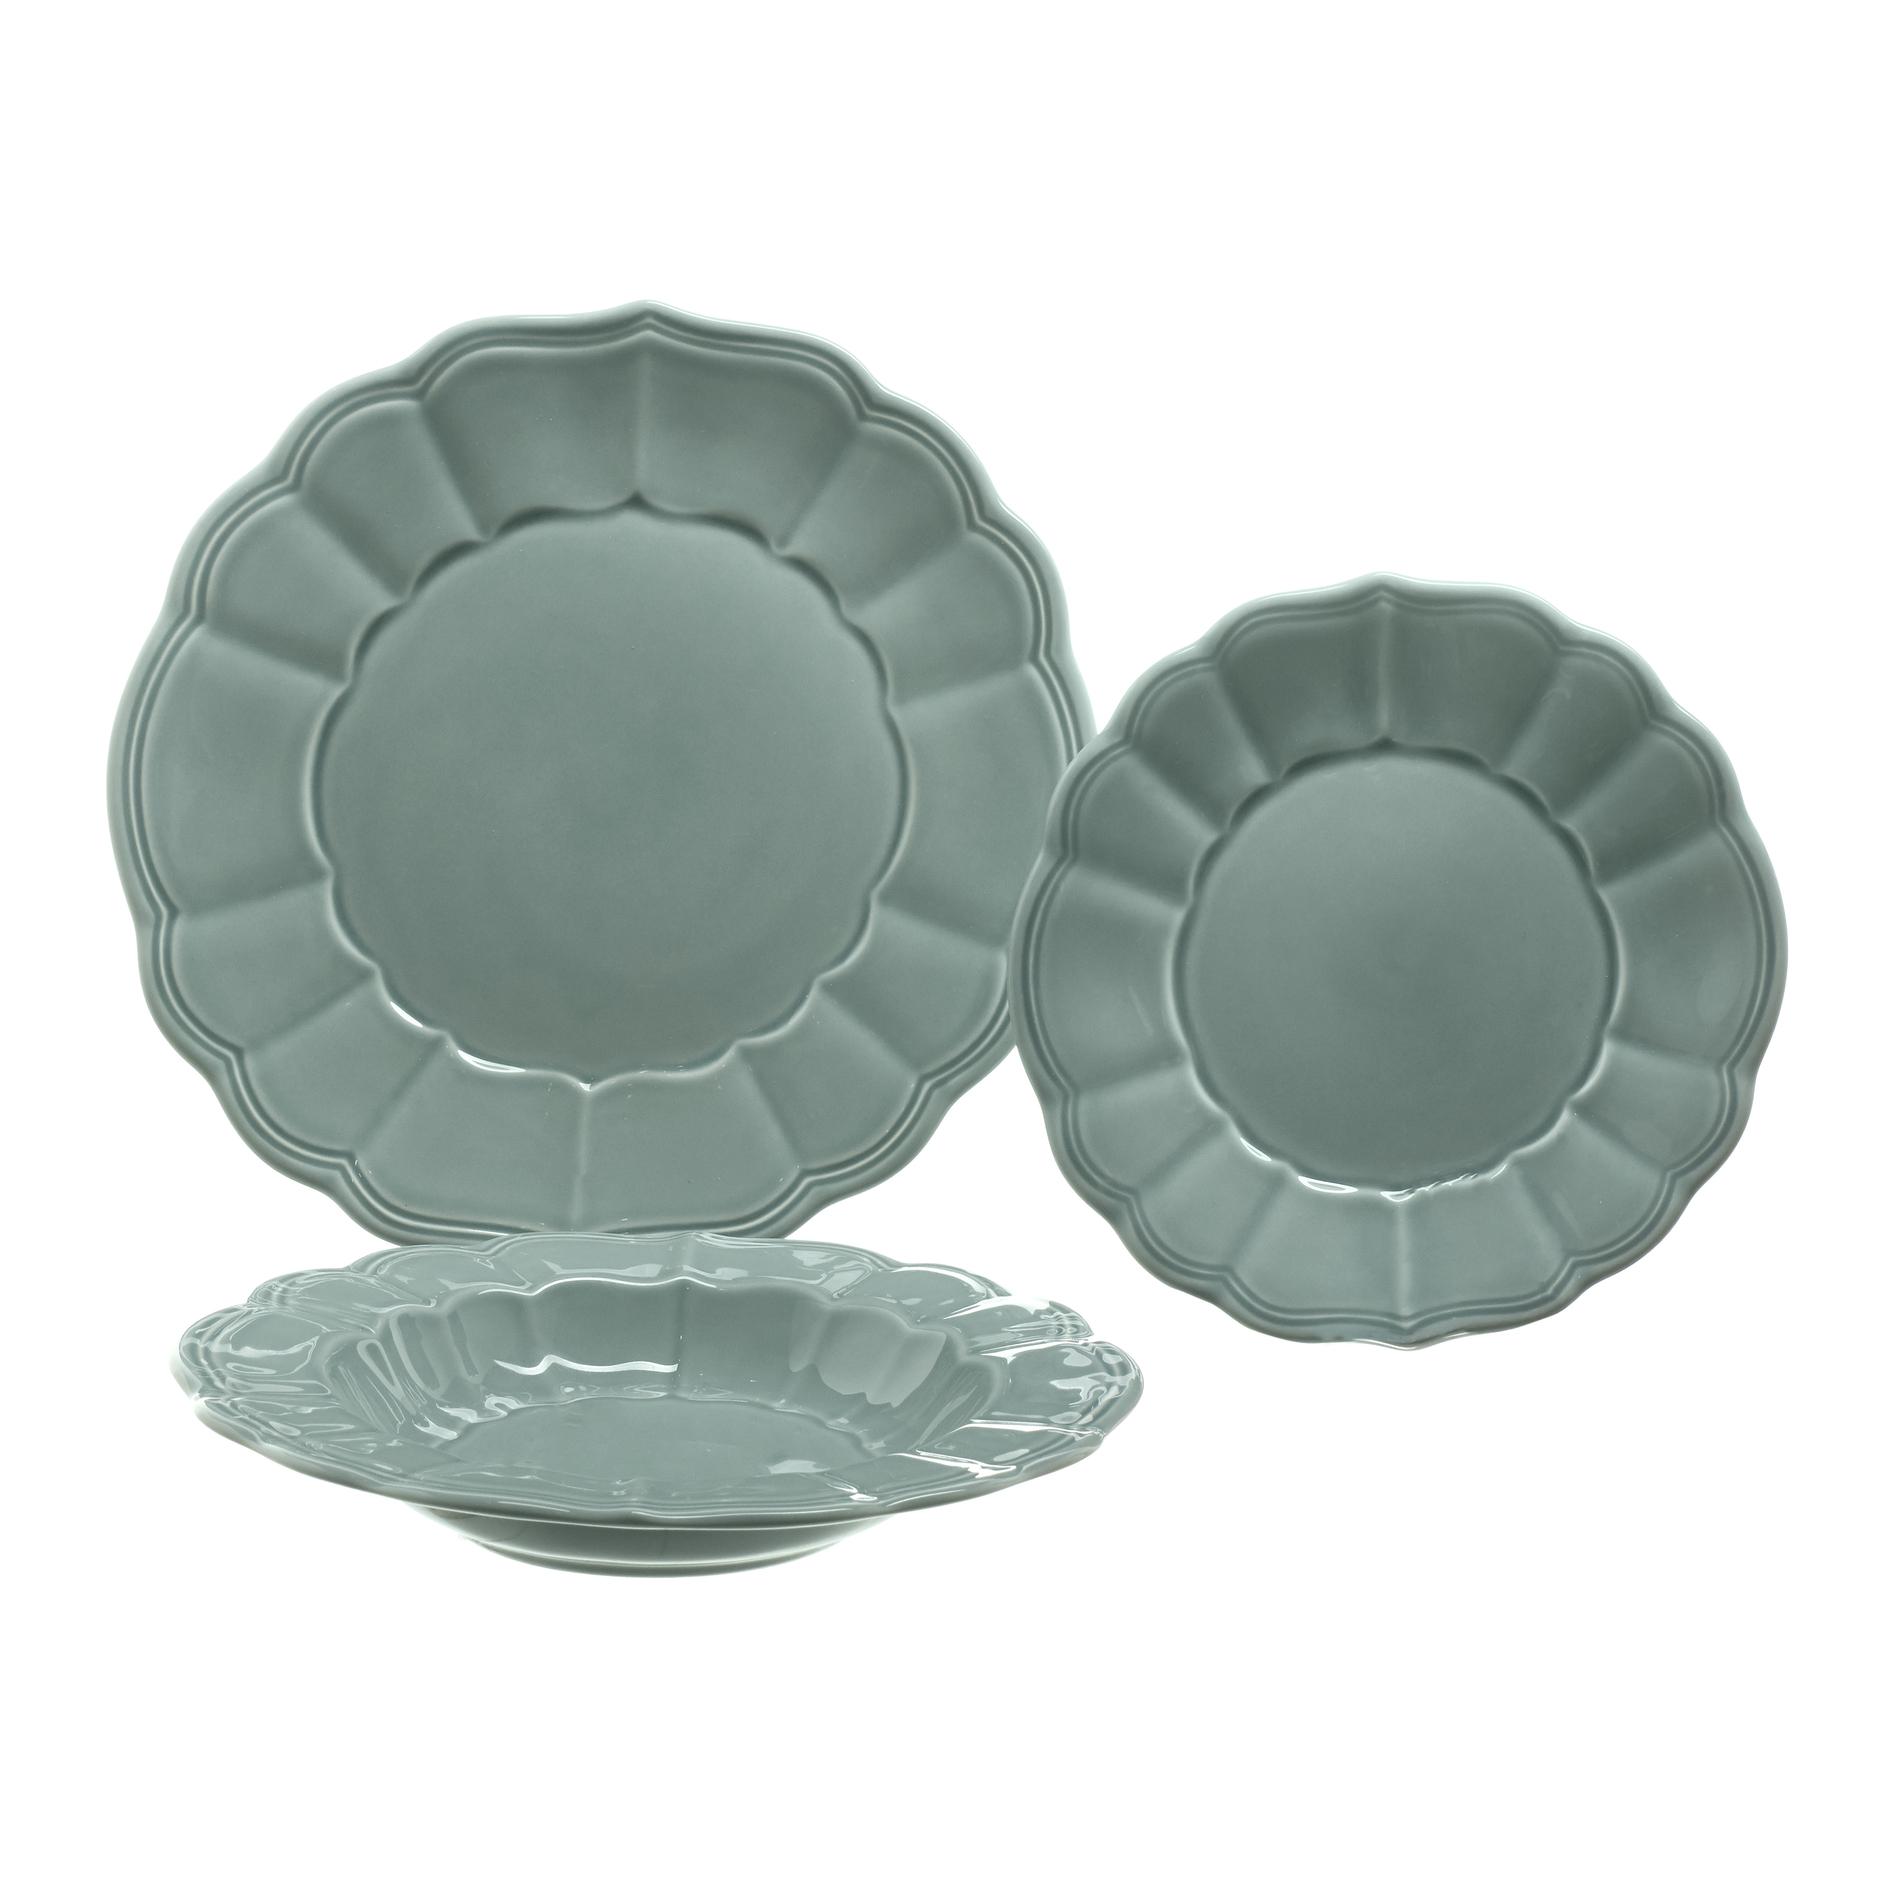 18-piece Portuguese ceramic dinner service in Provençale style ...